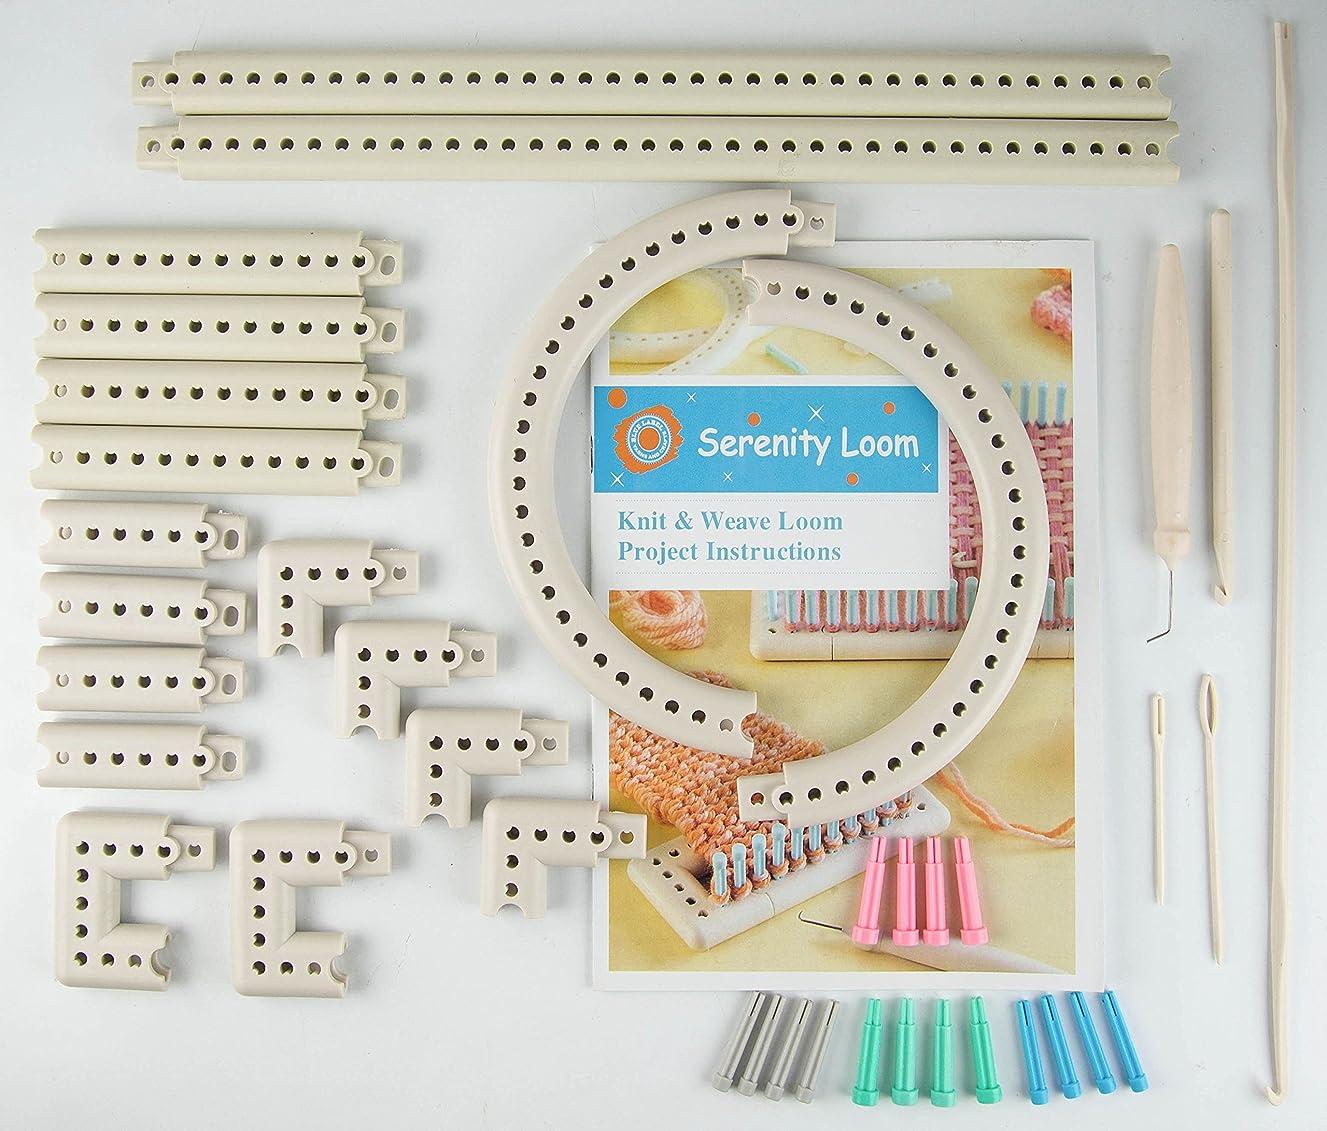 Feici - Multi-function Craft Yarn 5000-100 Knitting Board Knit Weave Loom Kit DIY Tool